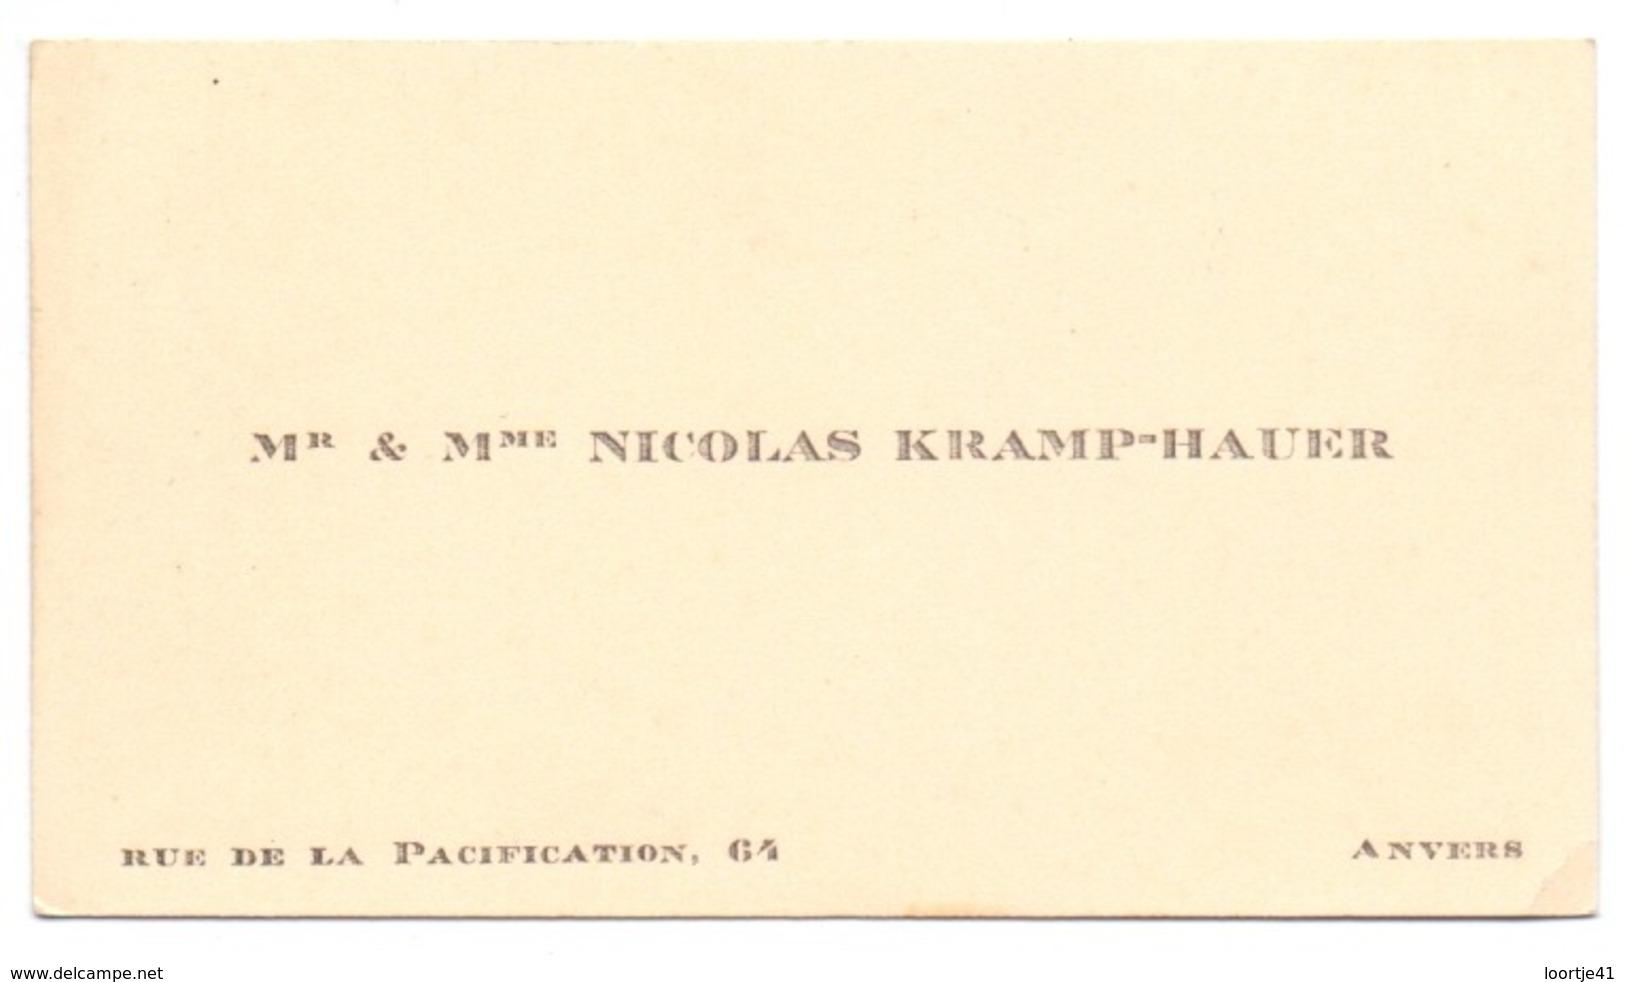 Visitekaartje - Carte Visite - Mr & Mme Nicolas Kramp - Hauer - Anvers Antwerpen - Cartoncini Da Visita